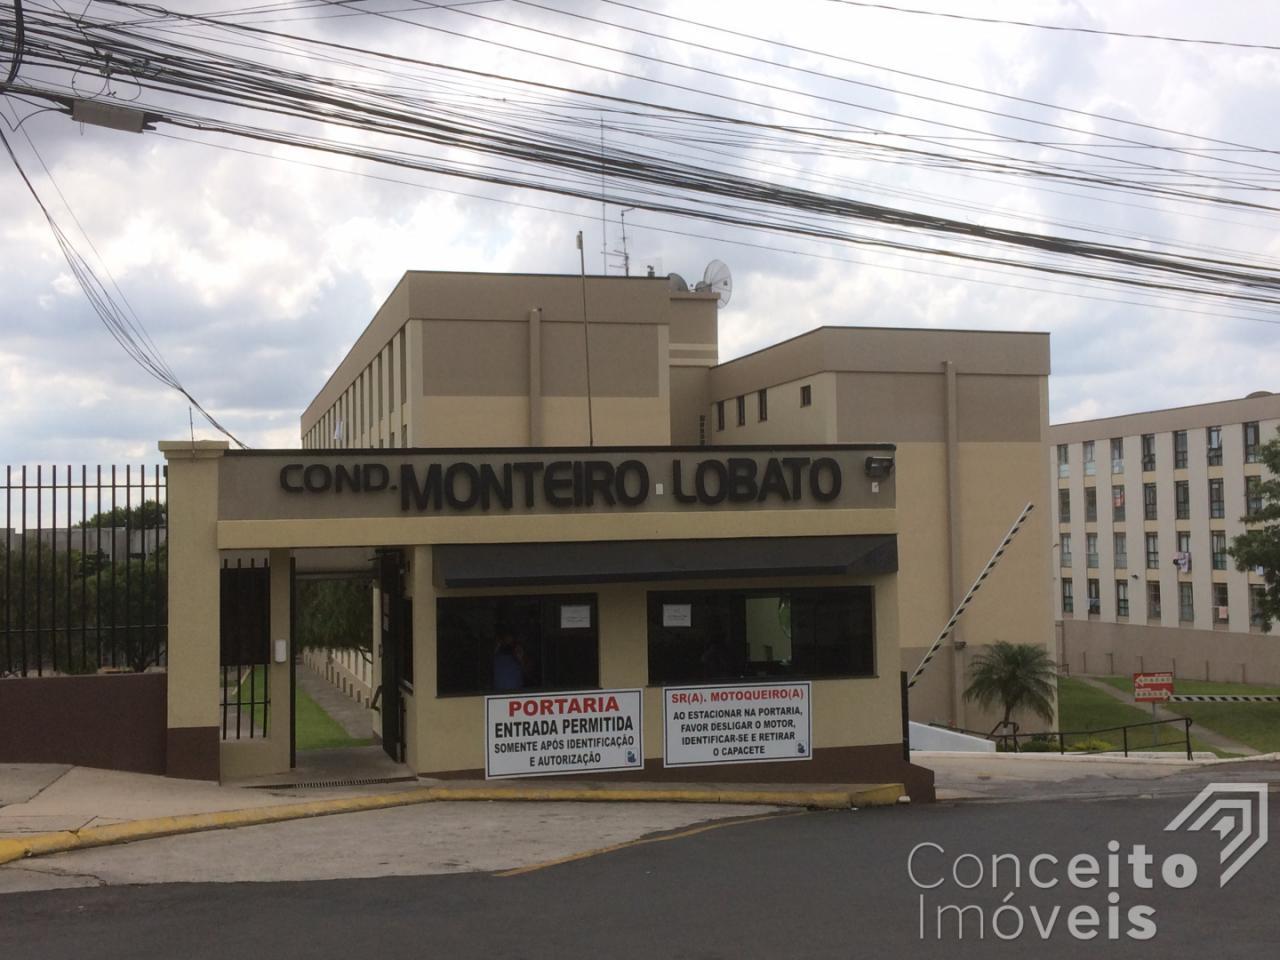 Apartamento Semi Mobiliado - Condomínio Monteiro Lobato